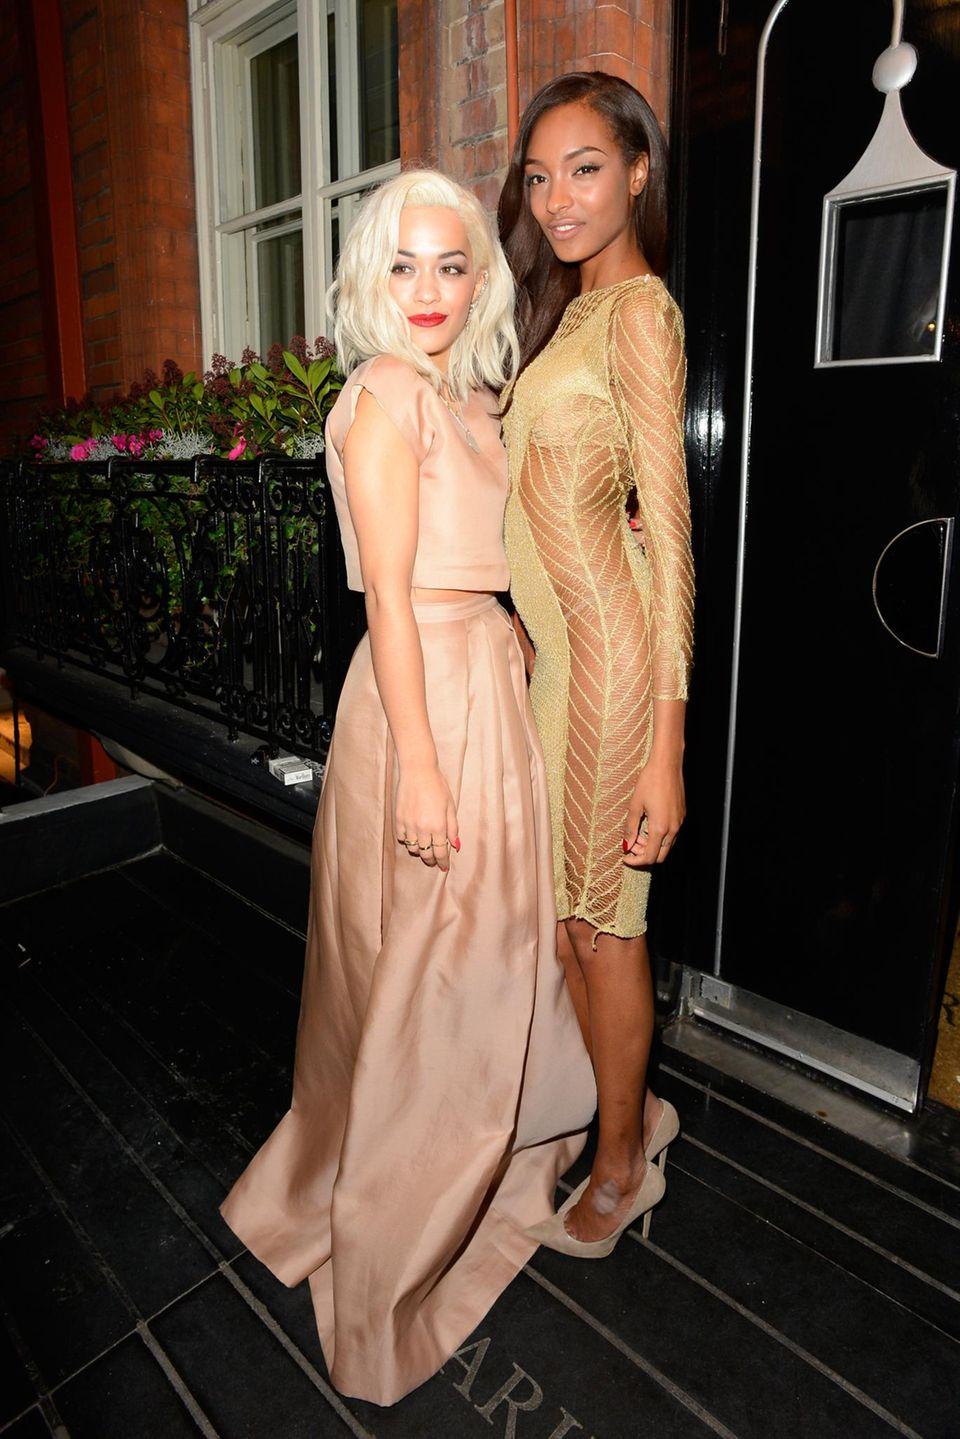 Rita Ora (Musician of the Year) und Jourdan Dunn (Model of the Year)